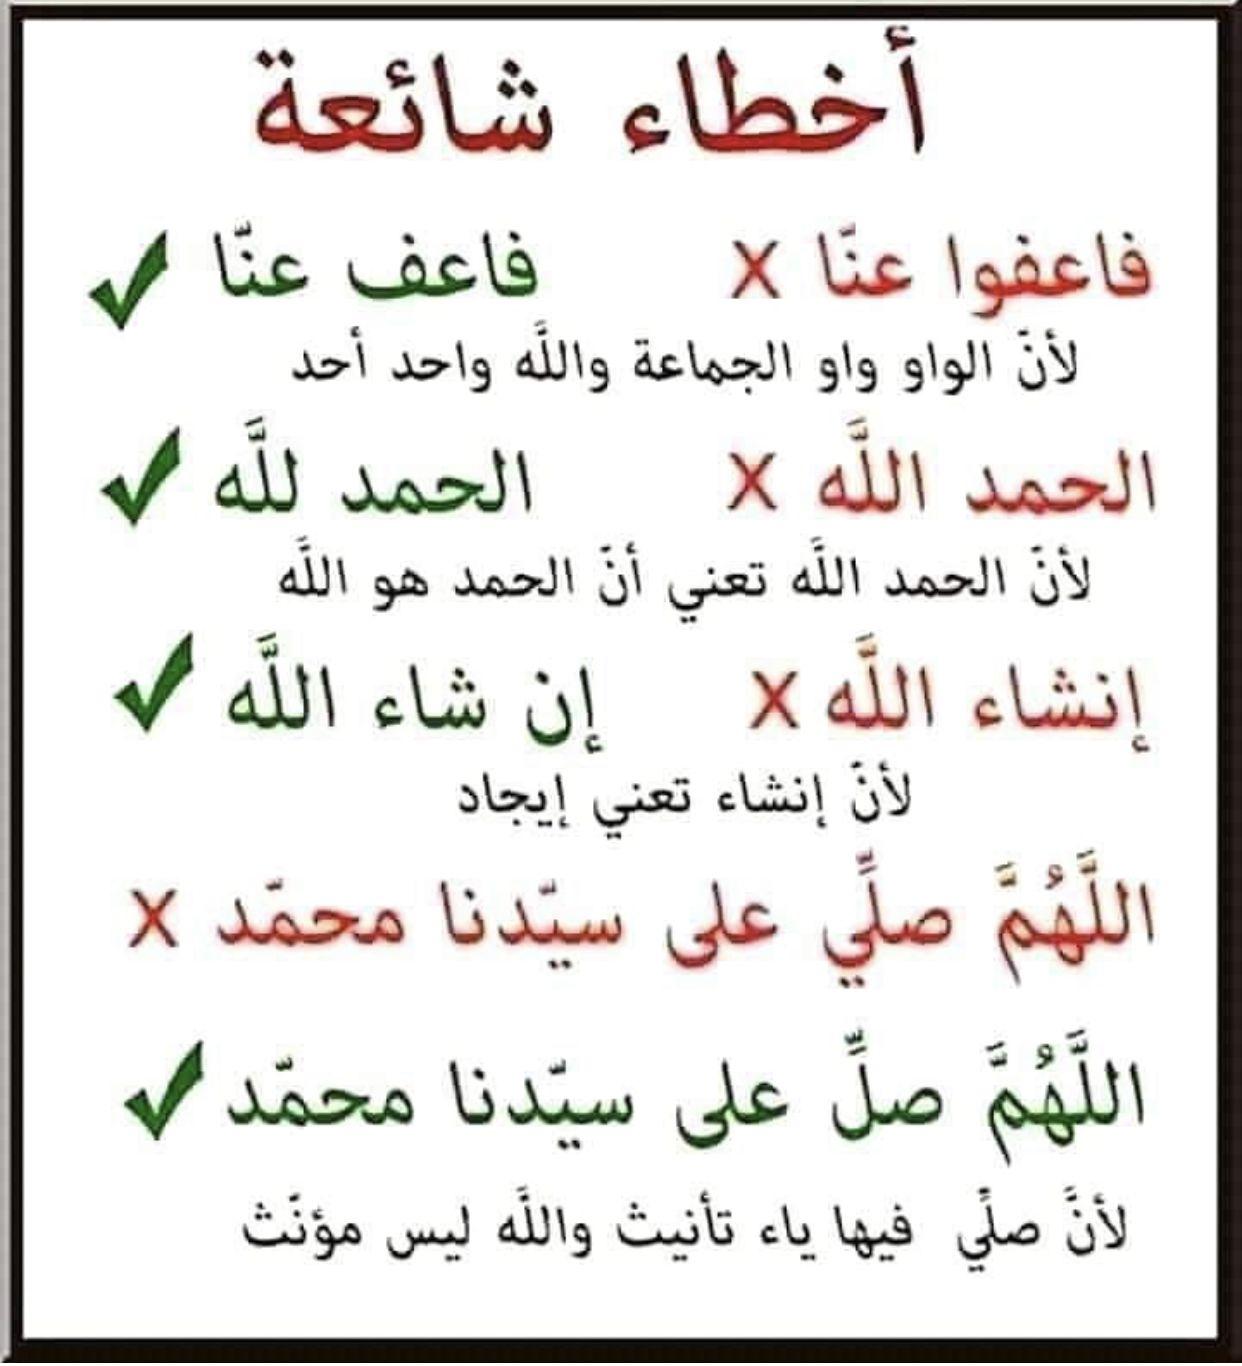 Pin By Nour Nouh On أخطاء و تصحيح In 2020 Math Islam Calligraphy